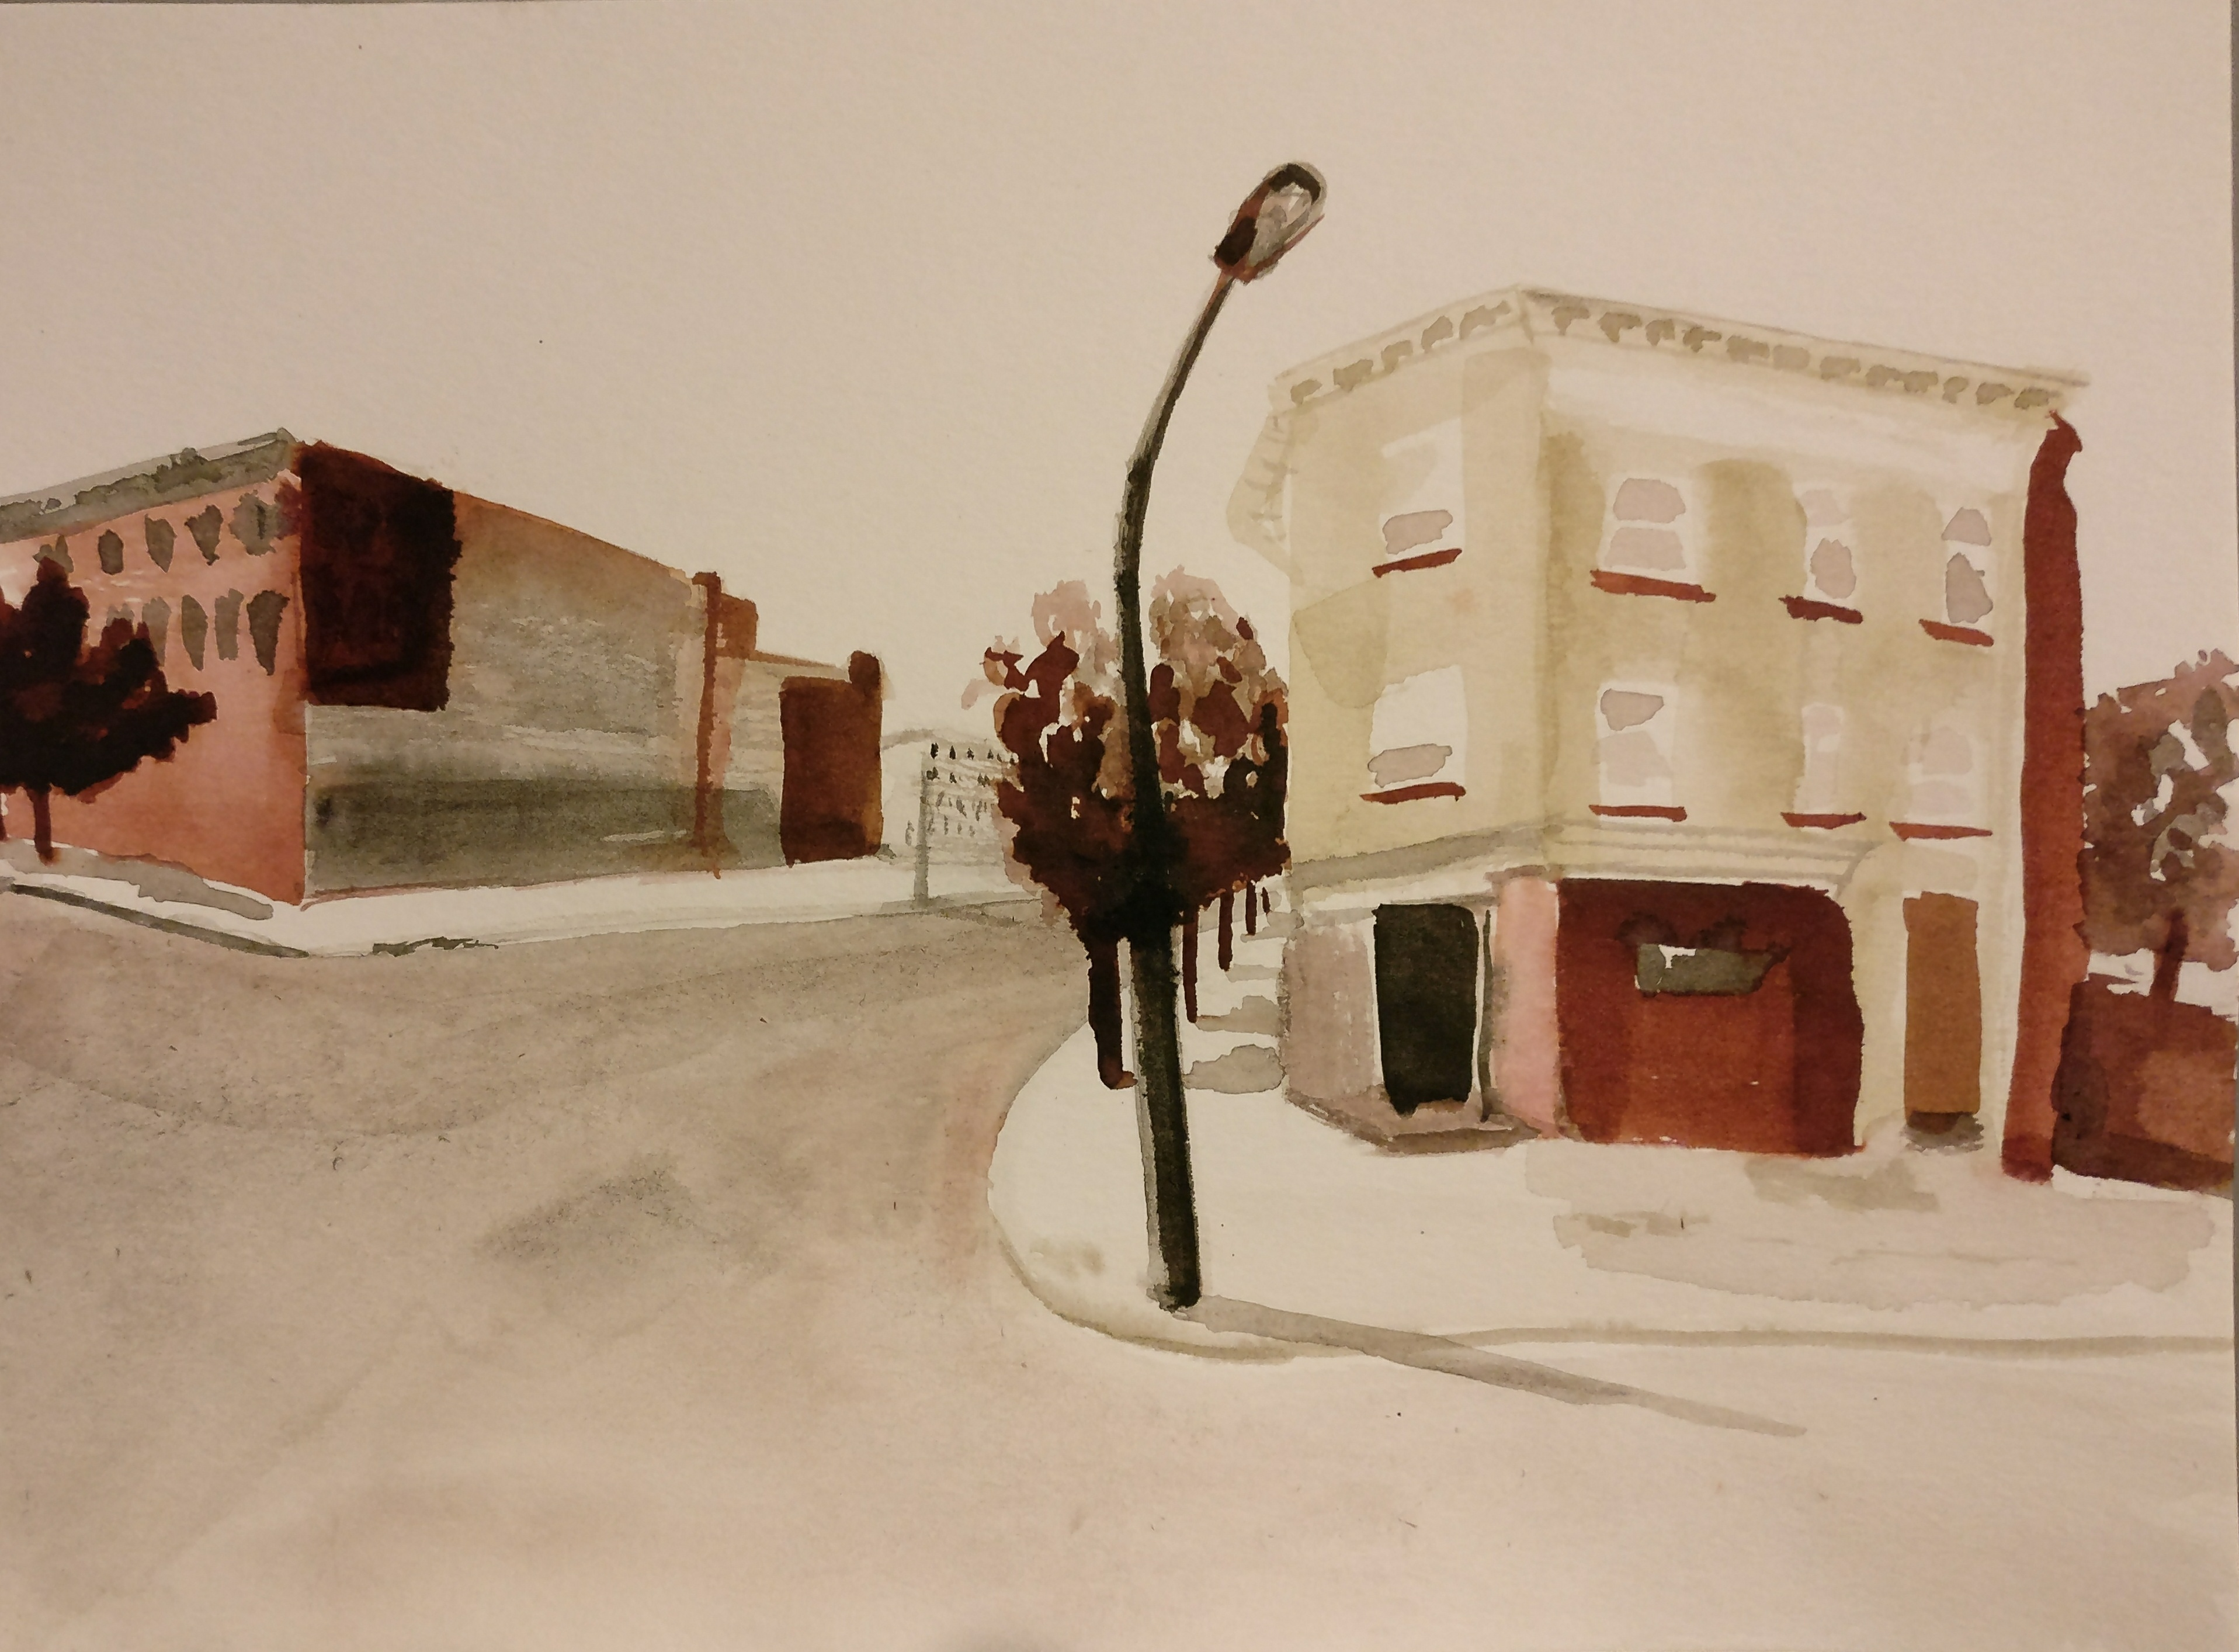 Freddie Gray. Stop 2: N. Fremont Ave. & Mosher St, Baltimore